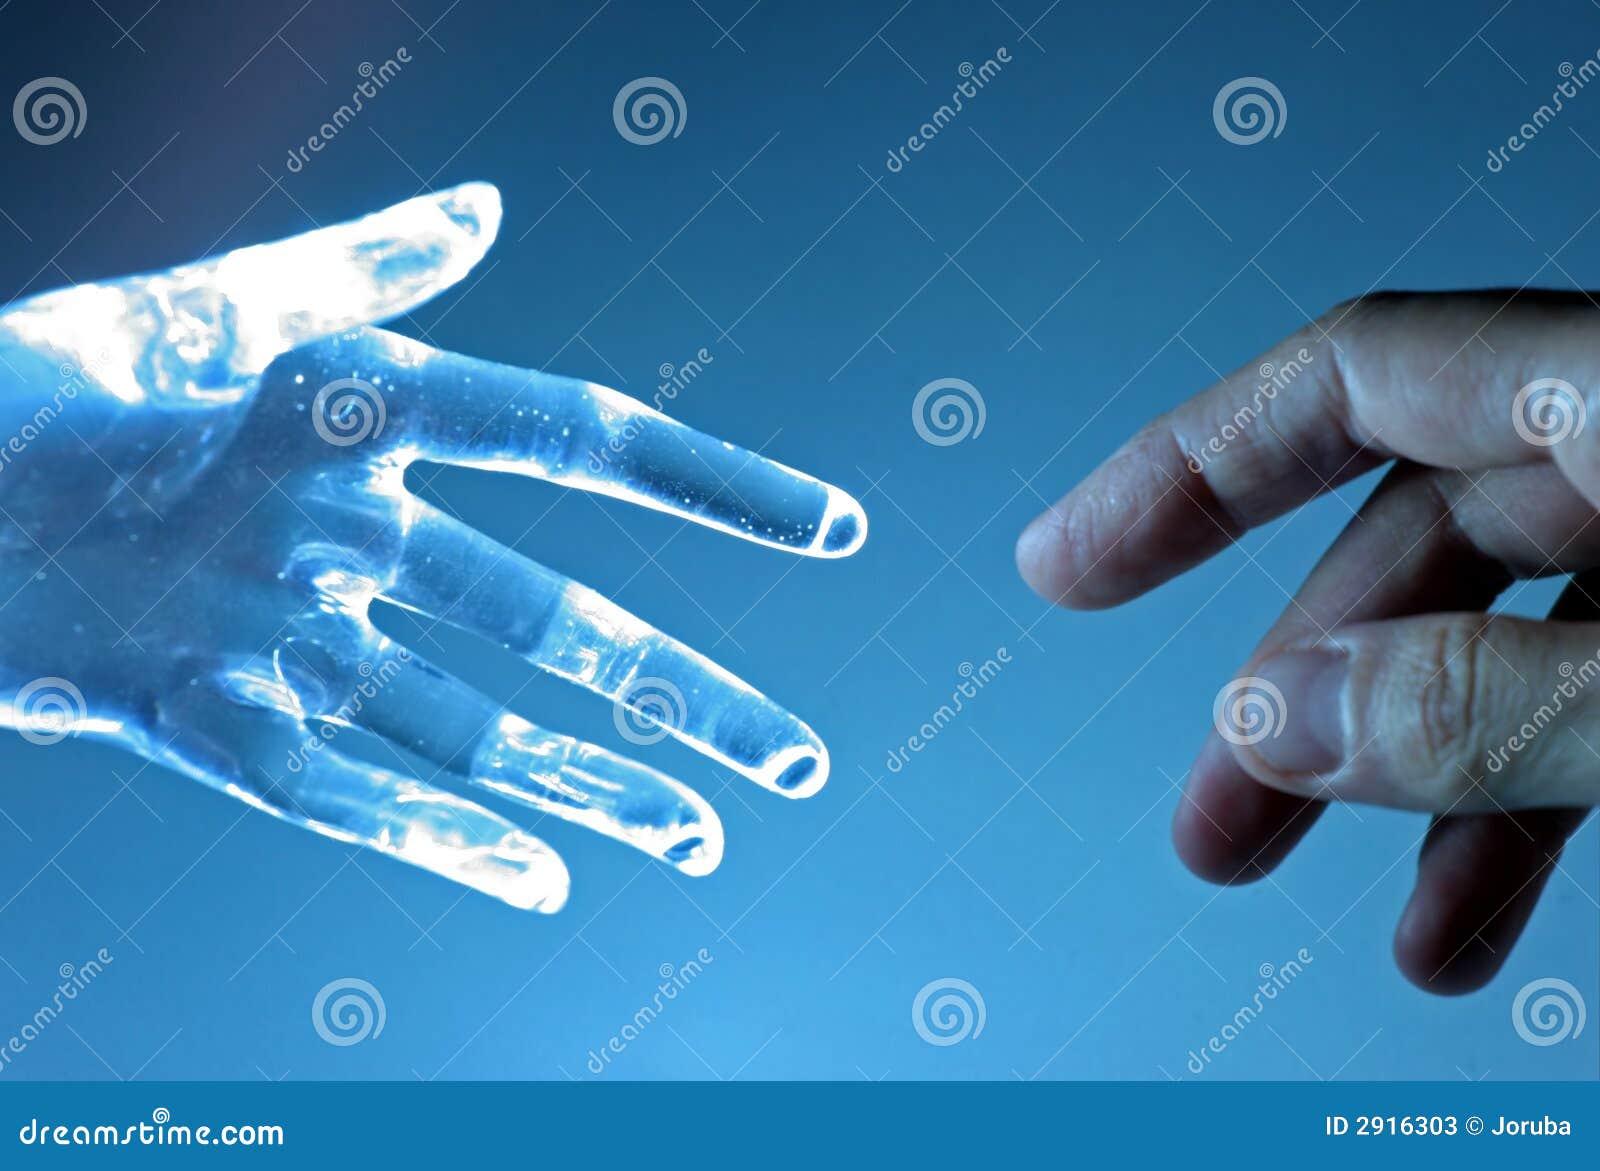 HTTP://ELLENPARKERBIBB.COM/PDF/DOWNLOAD-COOPERATIVITY-AND-REGULATION-IN-BIOCHEMICAL-PROCESSES.HTM